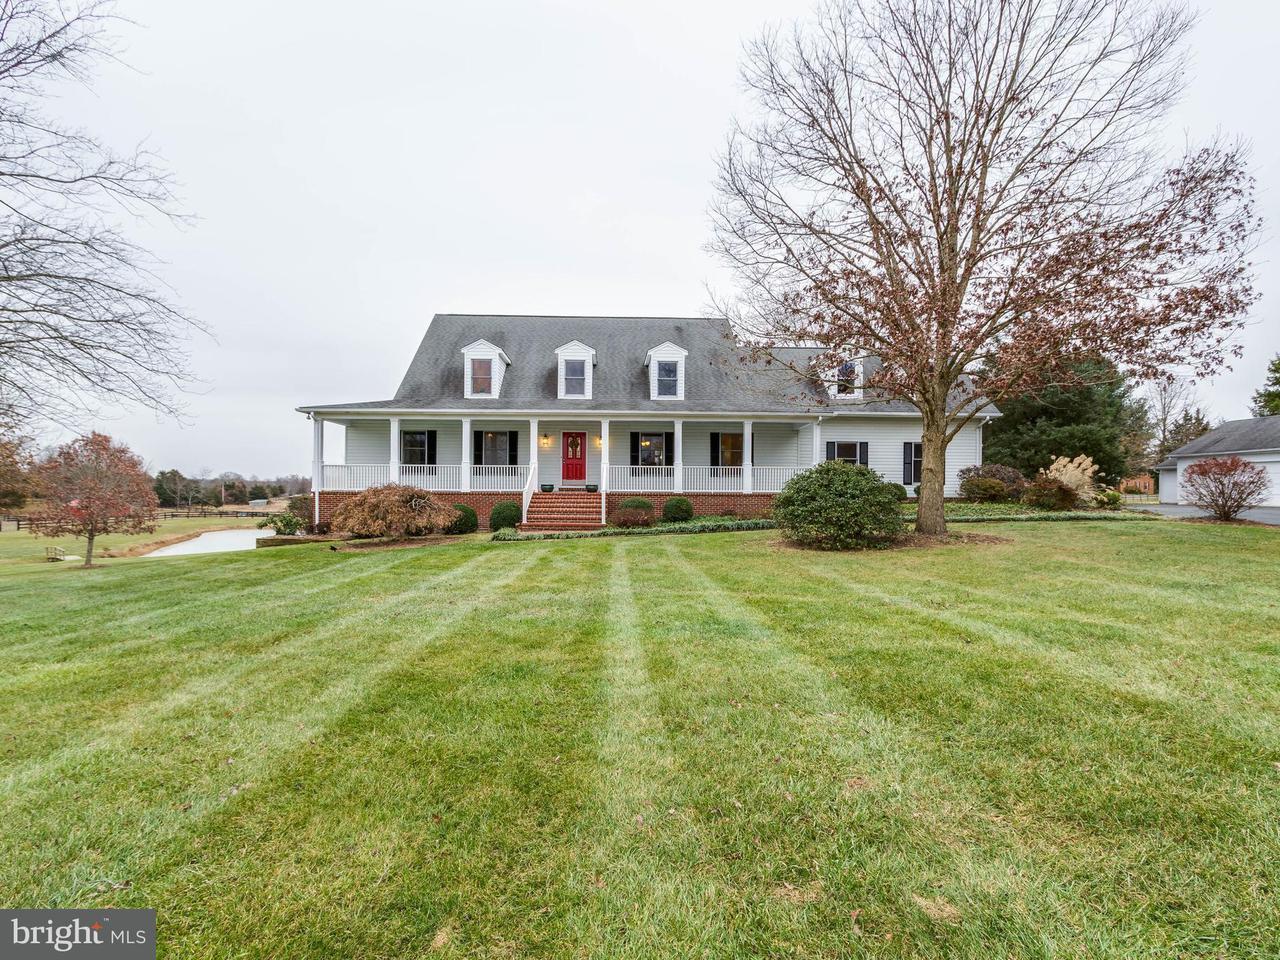 獨棟家庭住宅 為 出售 在 8107 ROGUES Road 8107 ROGUES Road Catlett, 弗吉尼亞州 20119 美國